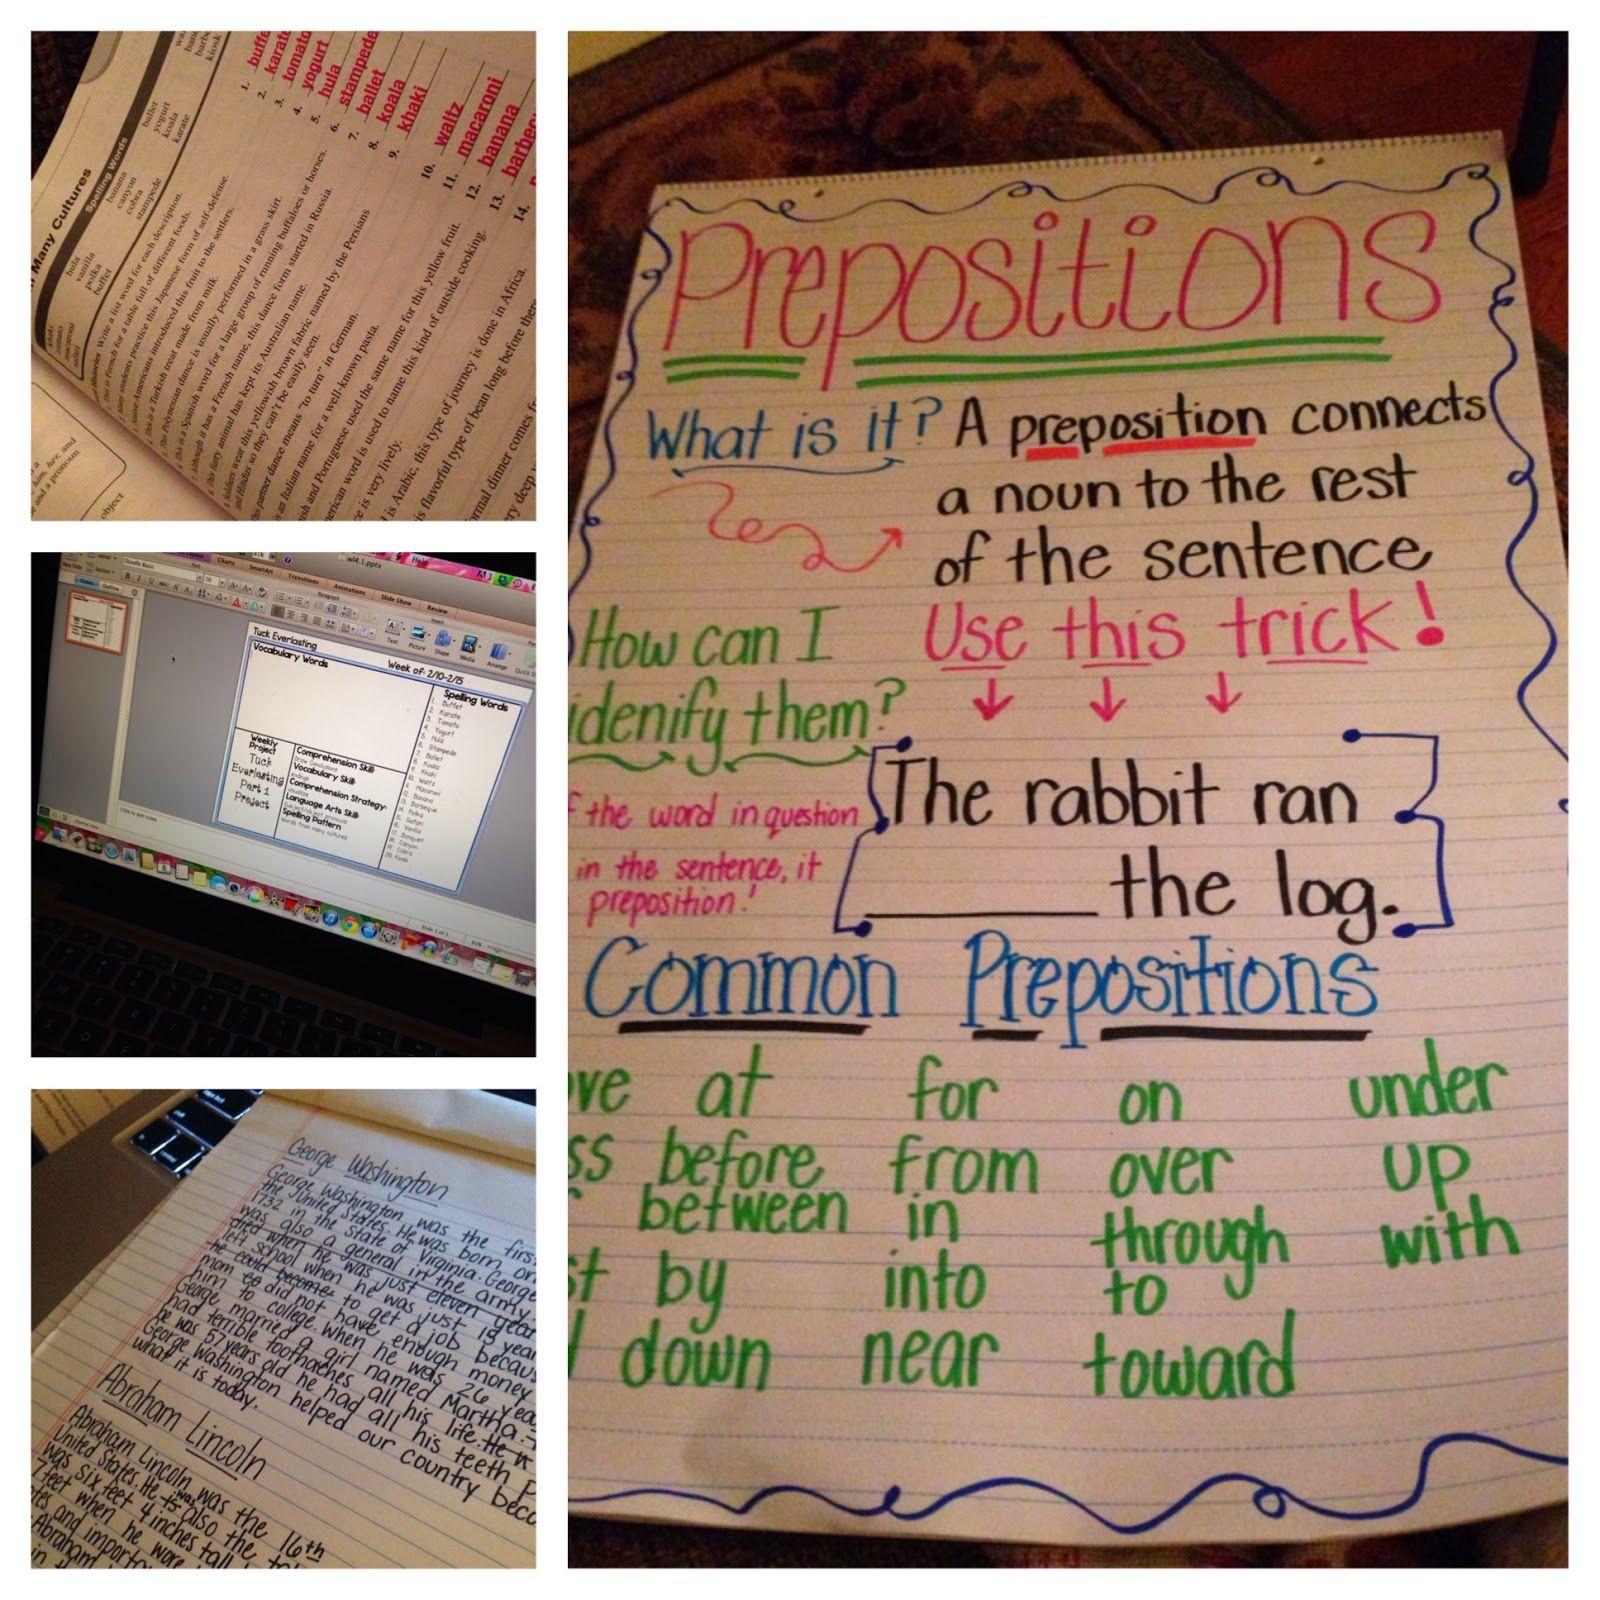 16 Prepositions in 5th grade ideas   prepositions [ 1600 x 1600 Pixel ]